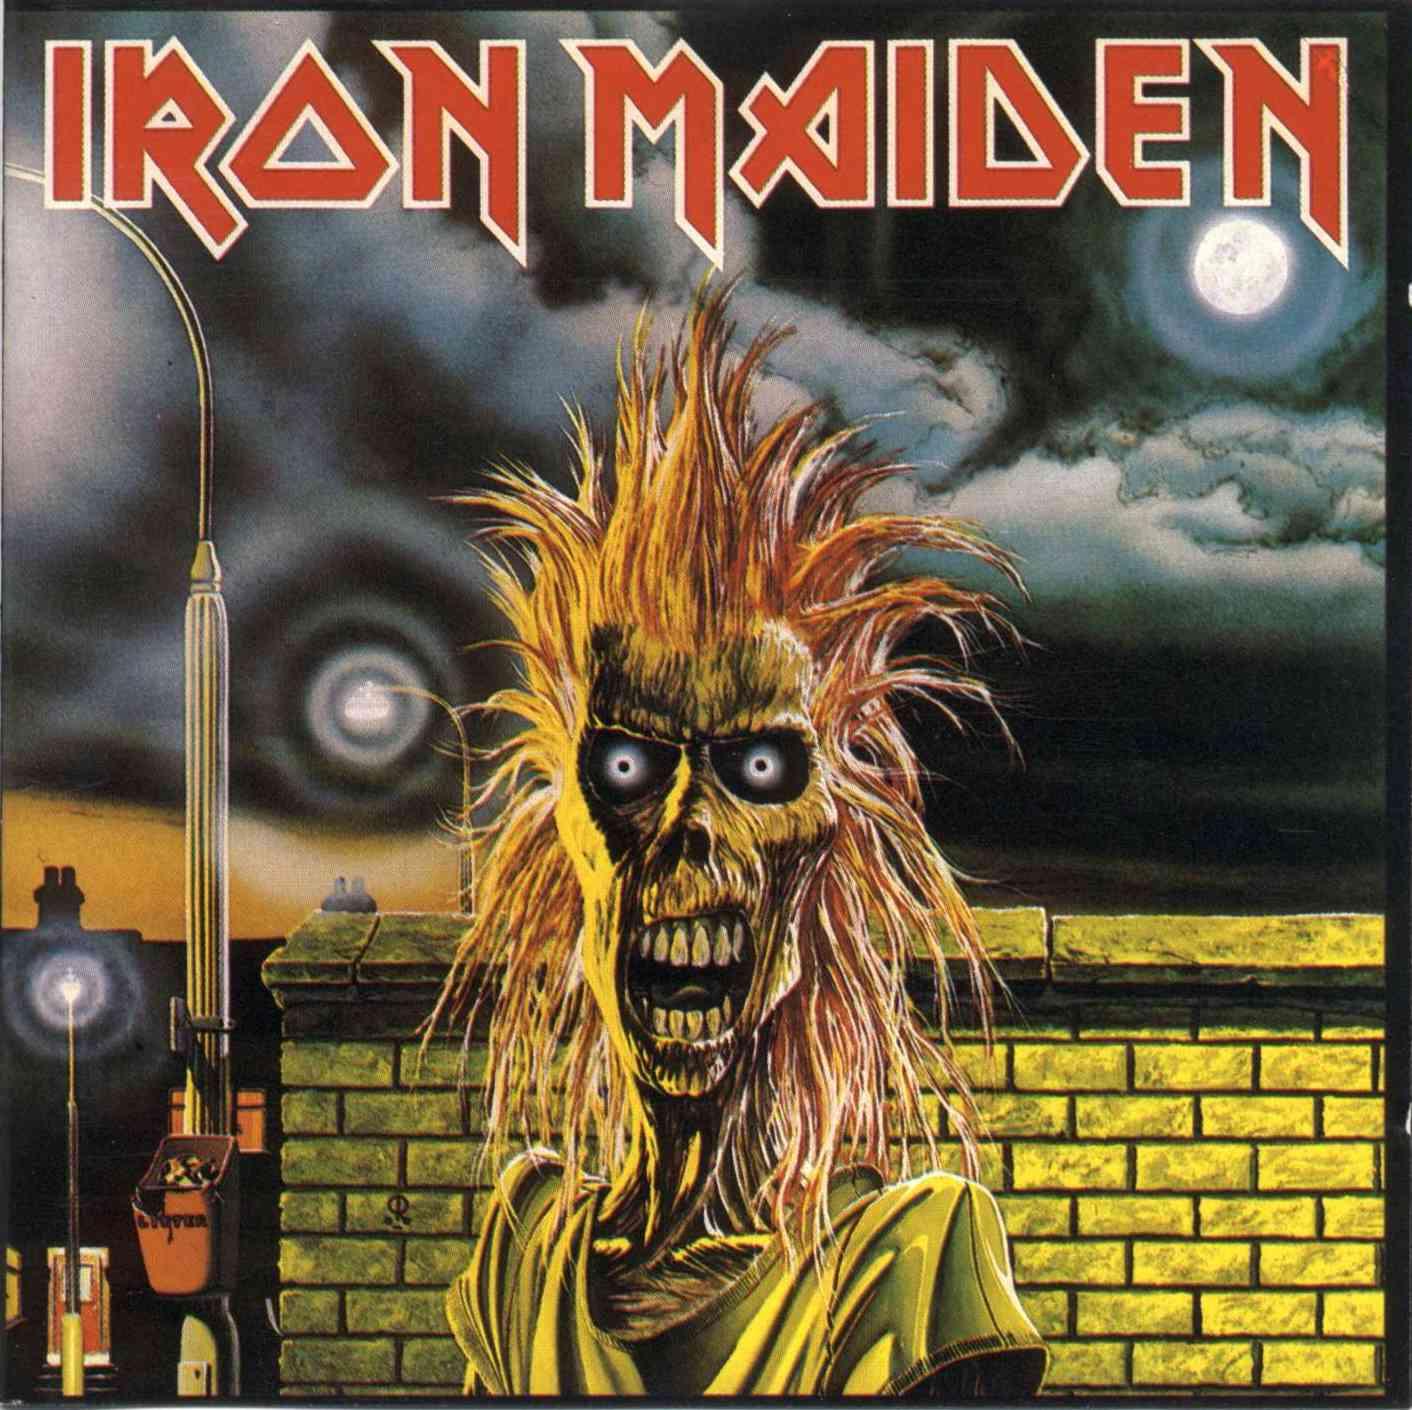 Iron Maiden The Bbc Archives Rar Download - livintastic